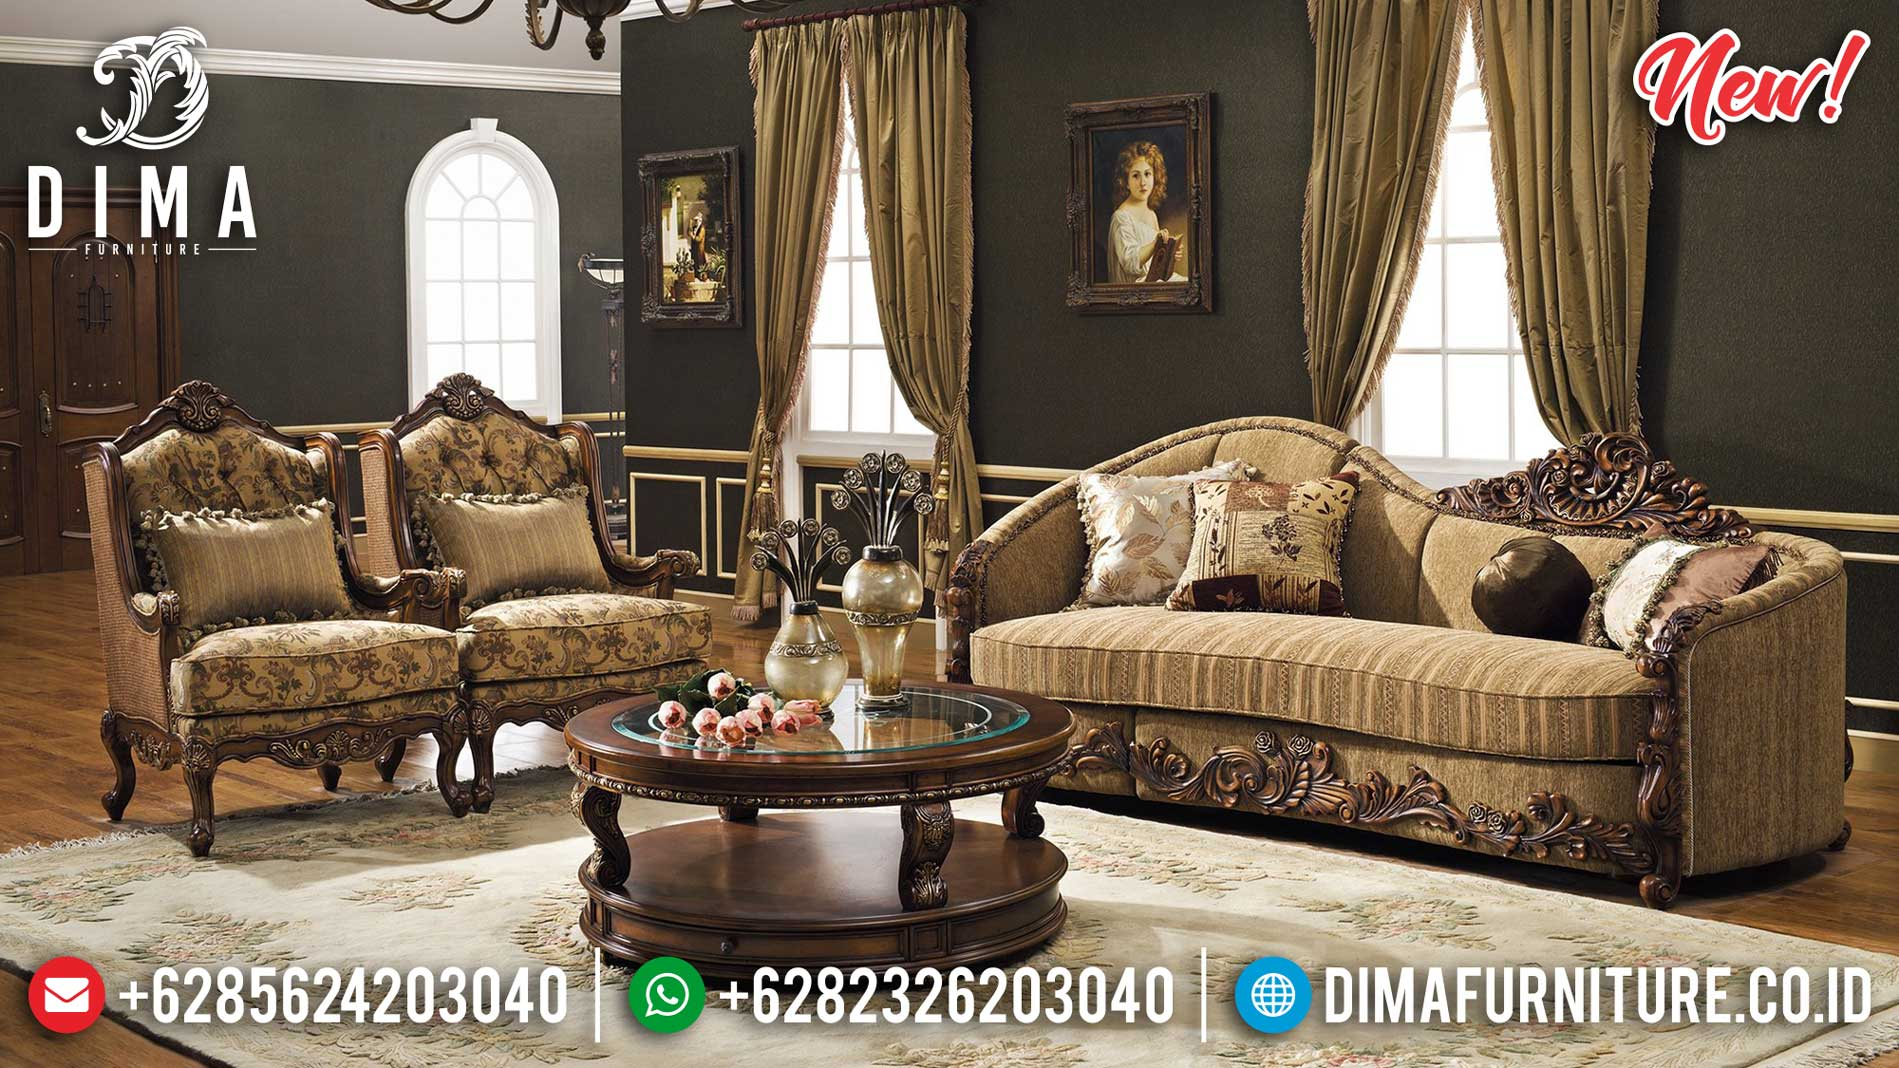 Set Sofa Tamu Mewah Jepara Luxury Type Solid Wood Grade A Mebel Jepara ST-1001